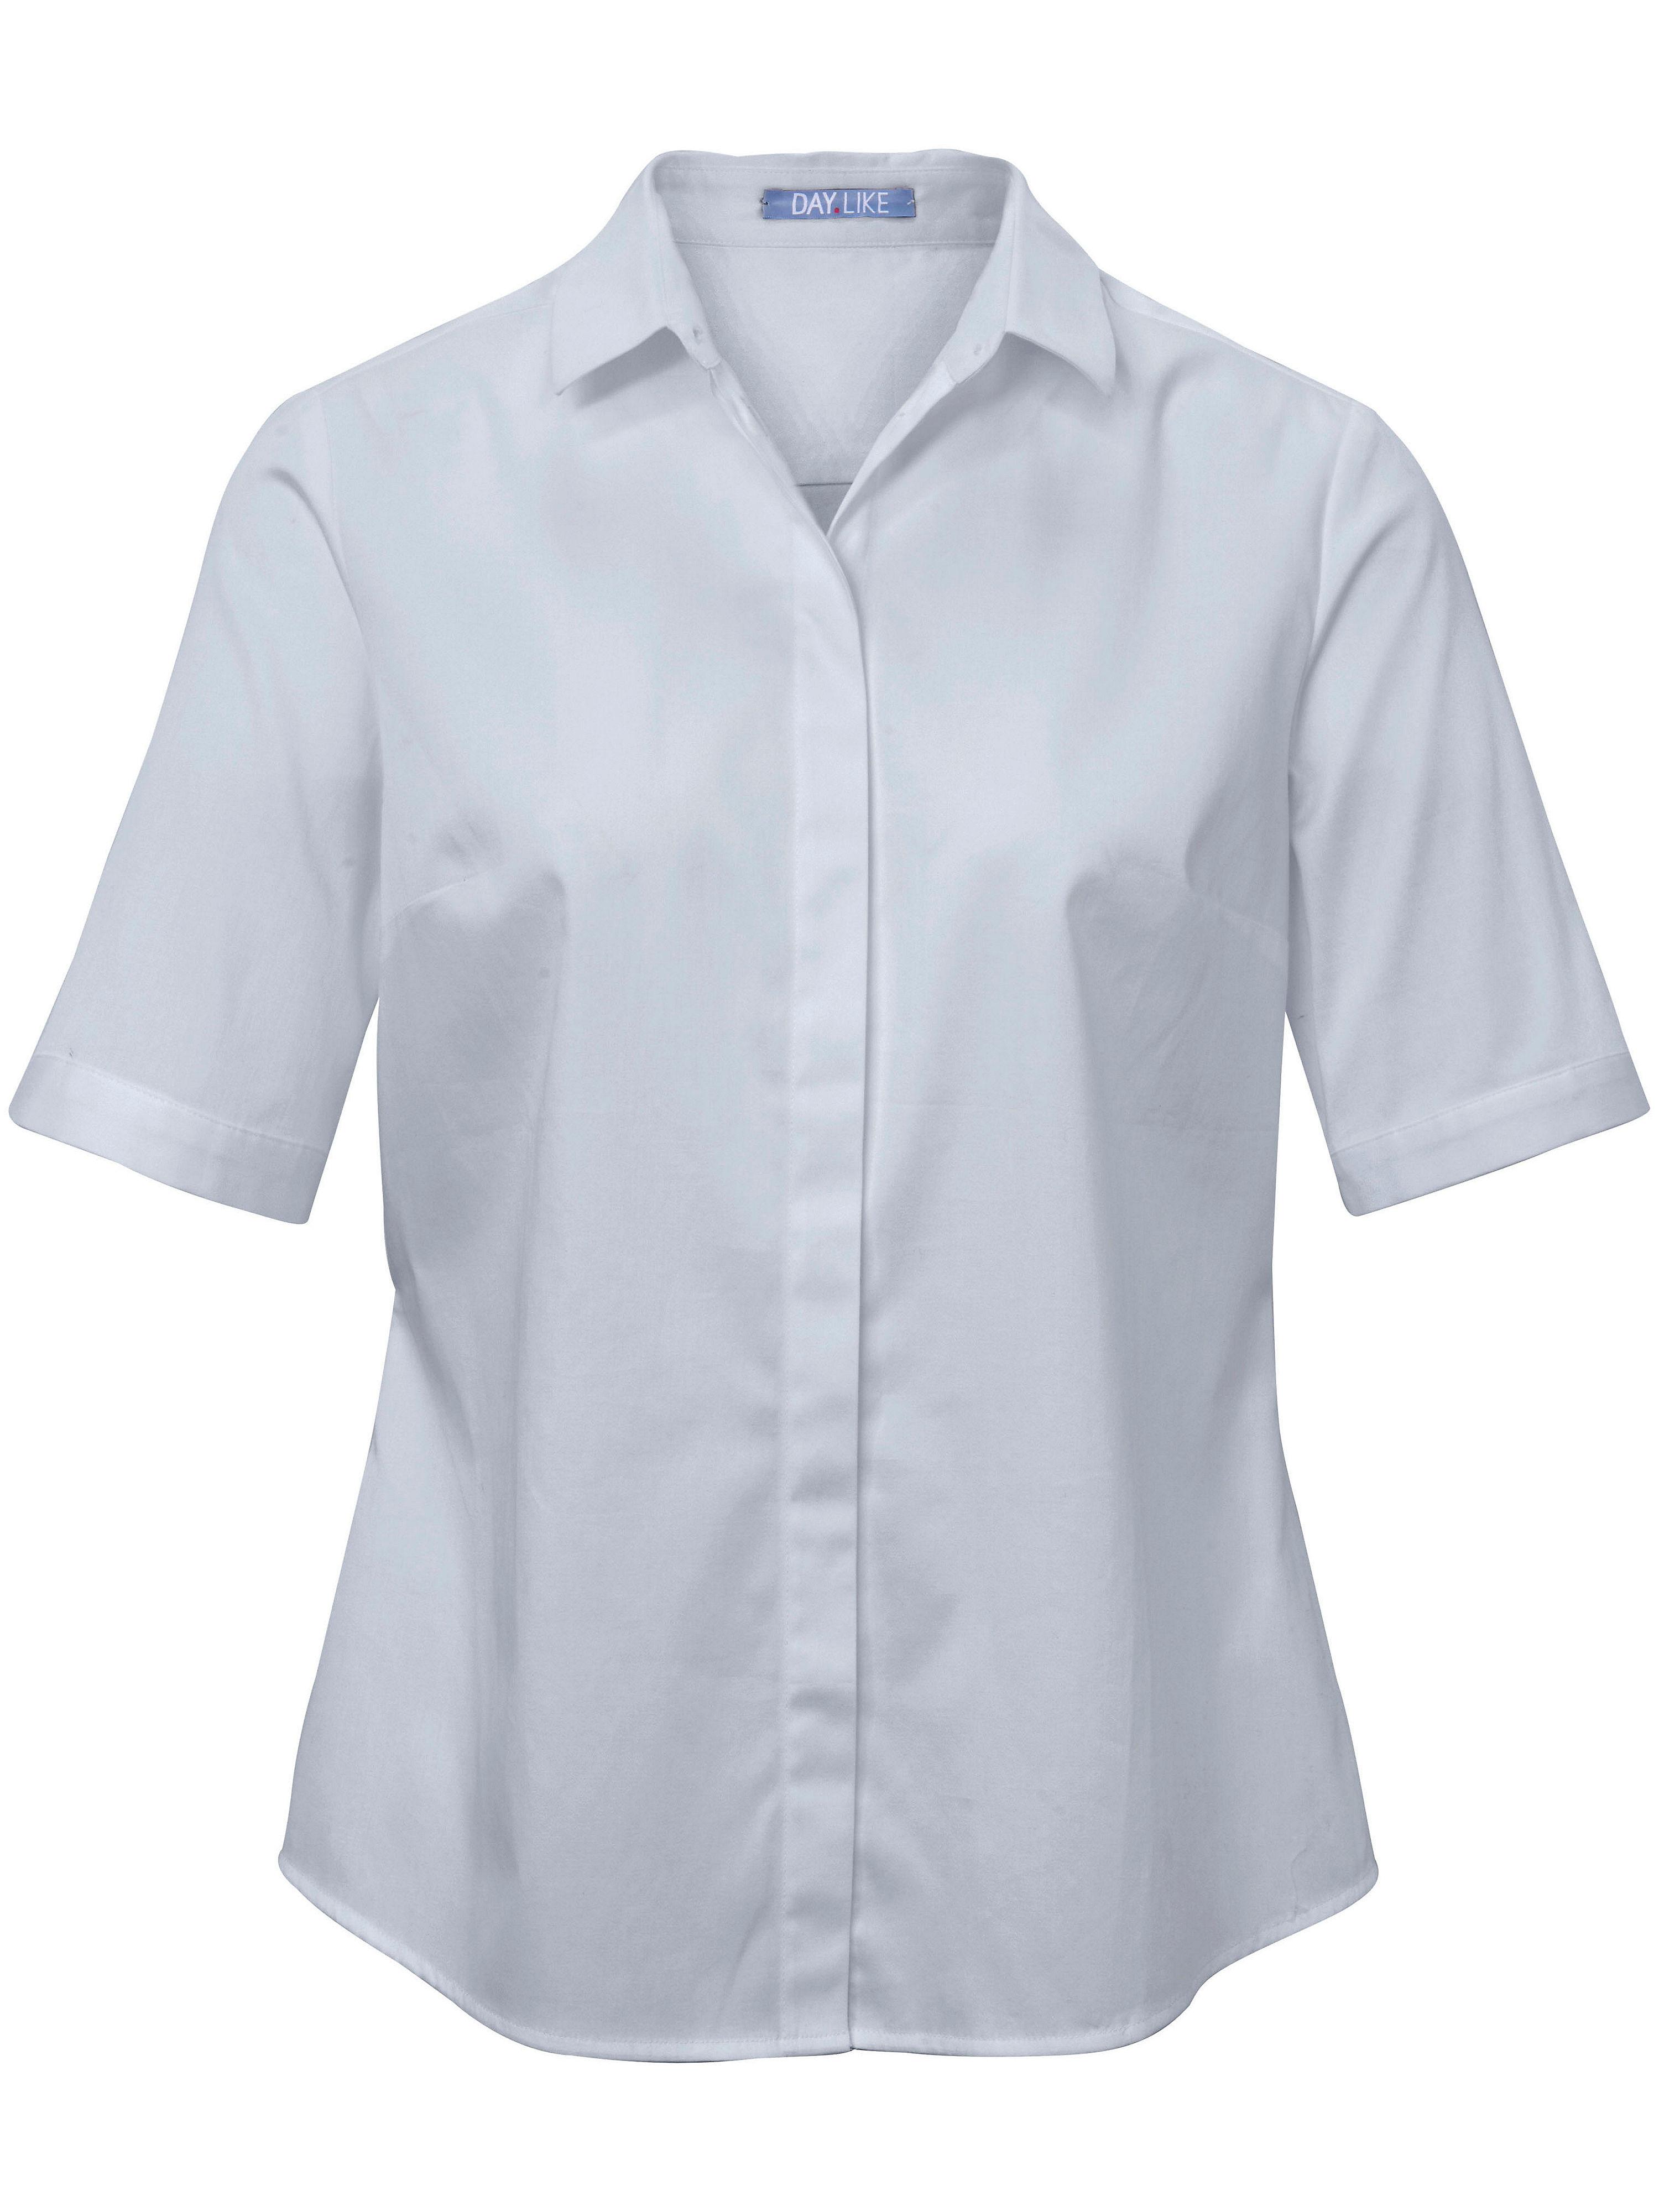 Le chemisier à manches courtes coton stretch  DAY.LIKE bleu taille 46